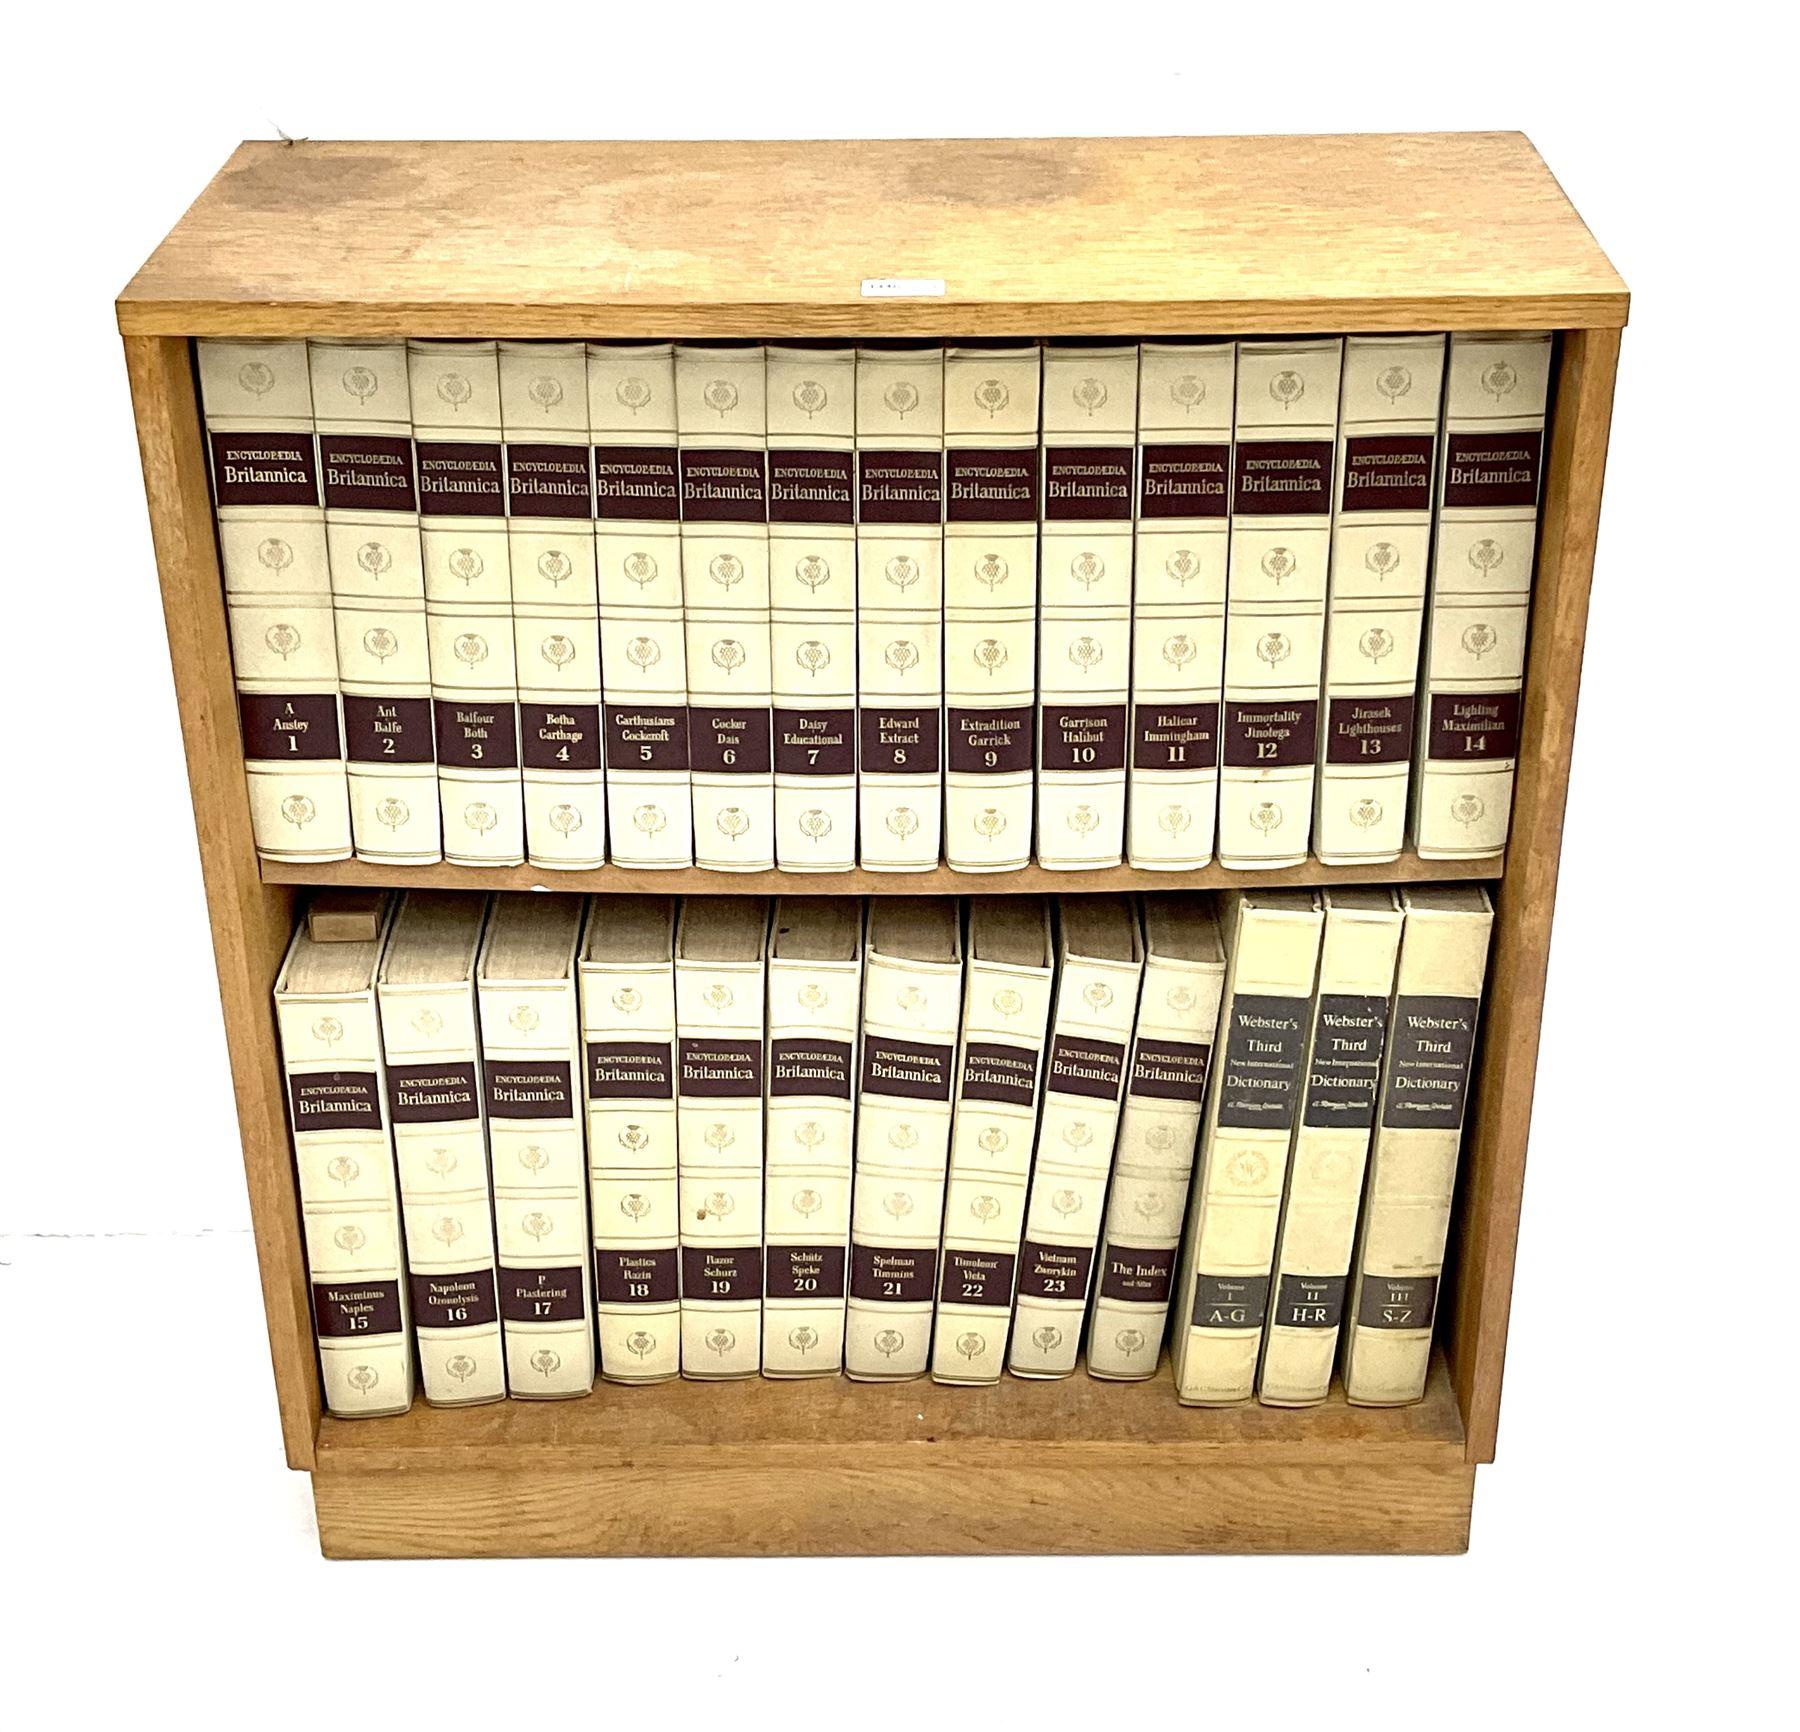 Light oak bookcase with Encylopedia Britania - Image 2 of 3